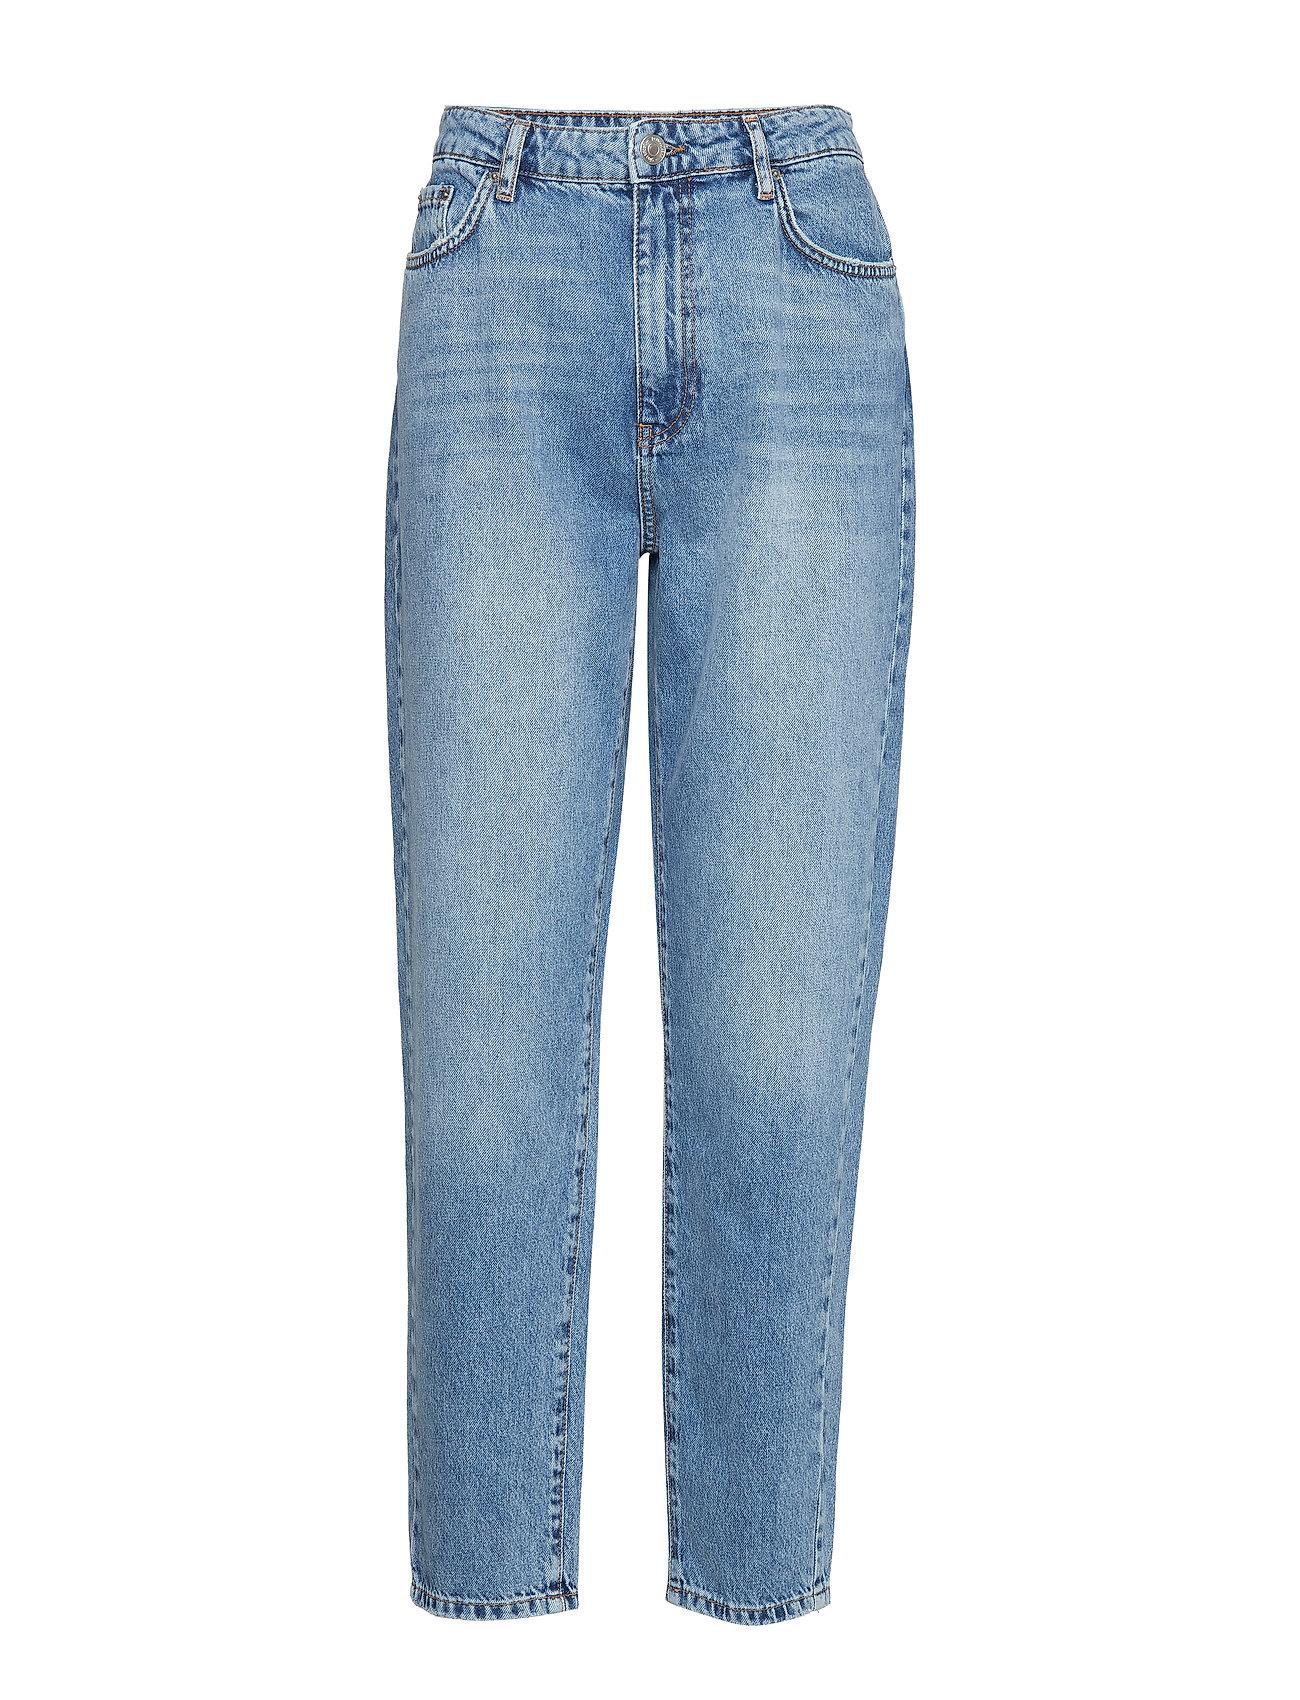 Gina Tricot Dagny mom jeans - MID BLUE